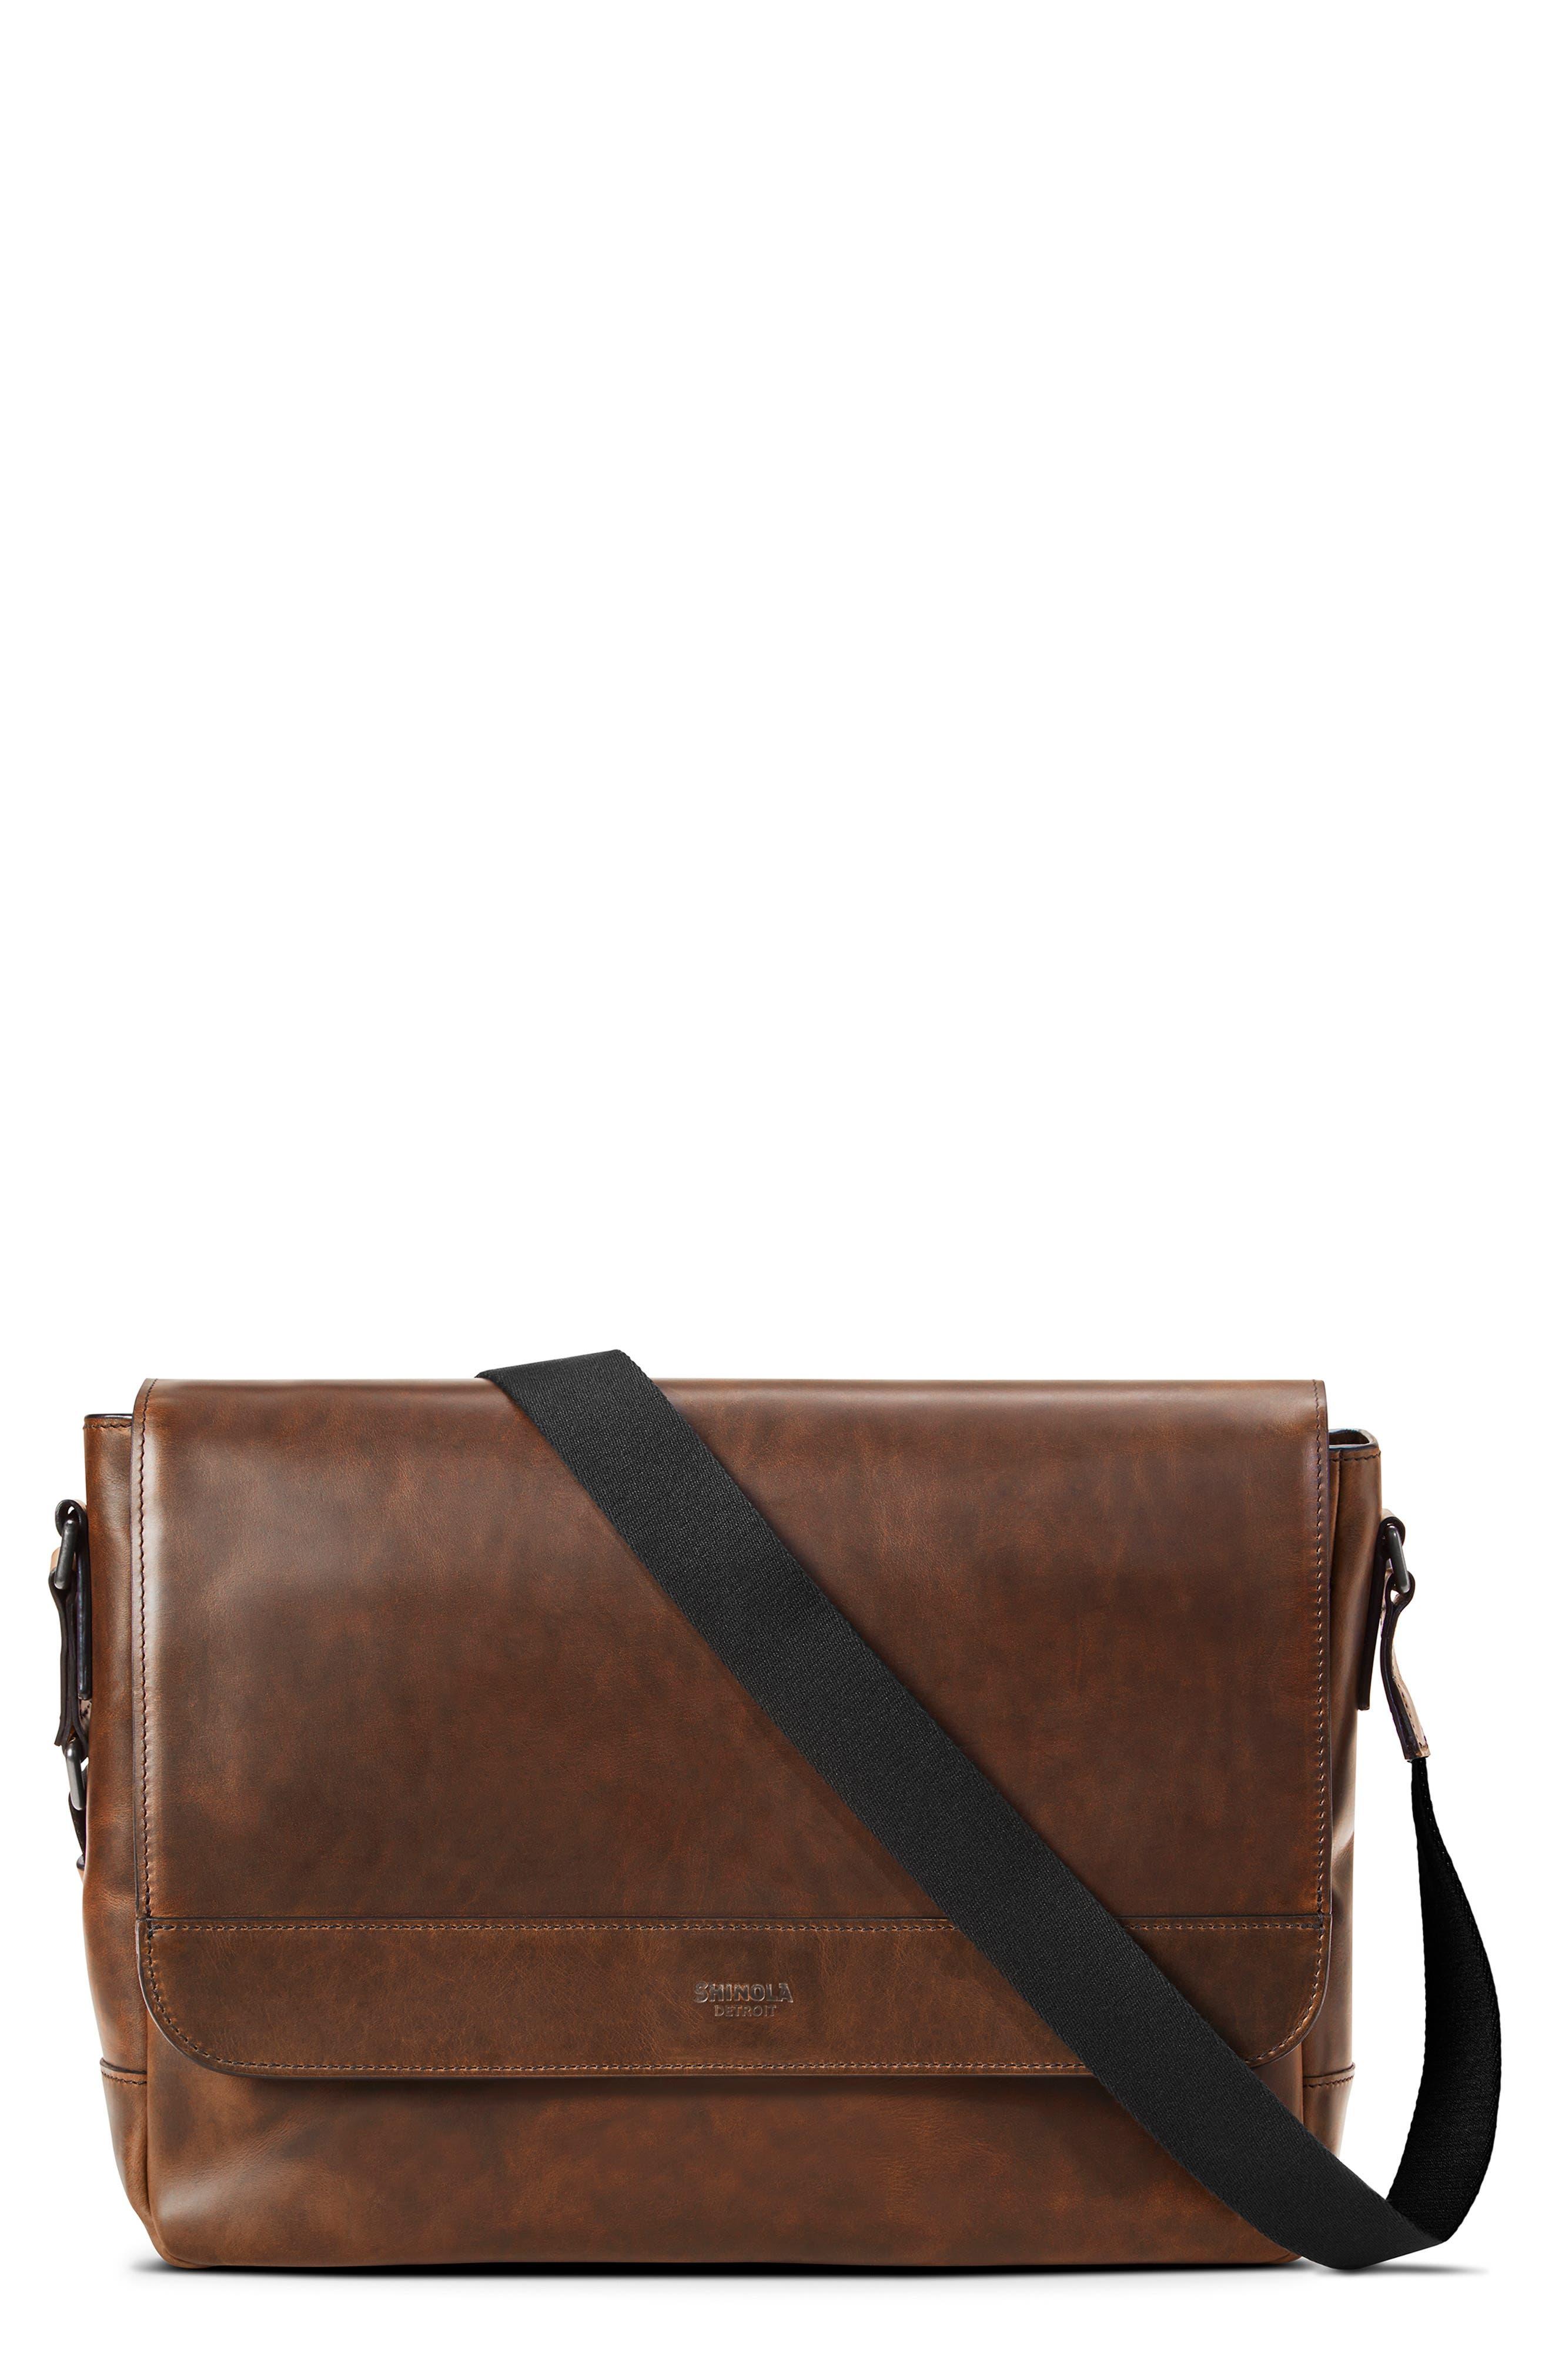 Luxburg Messenger Bag with Fantasy Dragon Design for 14.2-Inch Laptop